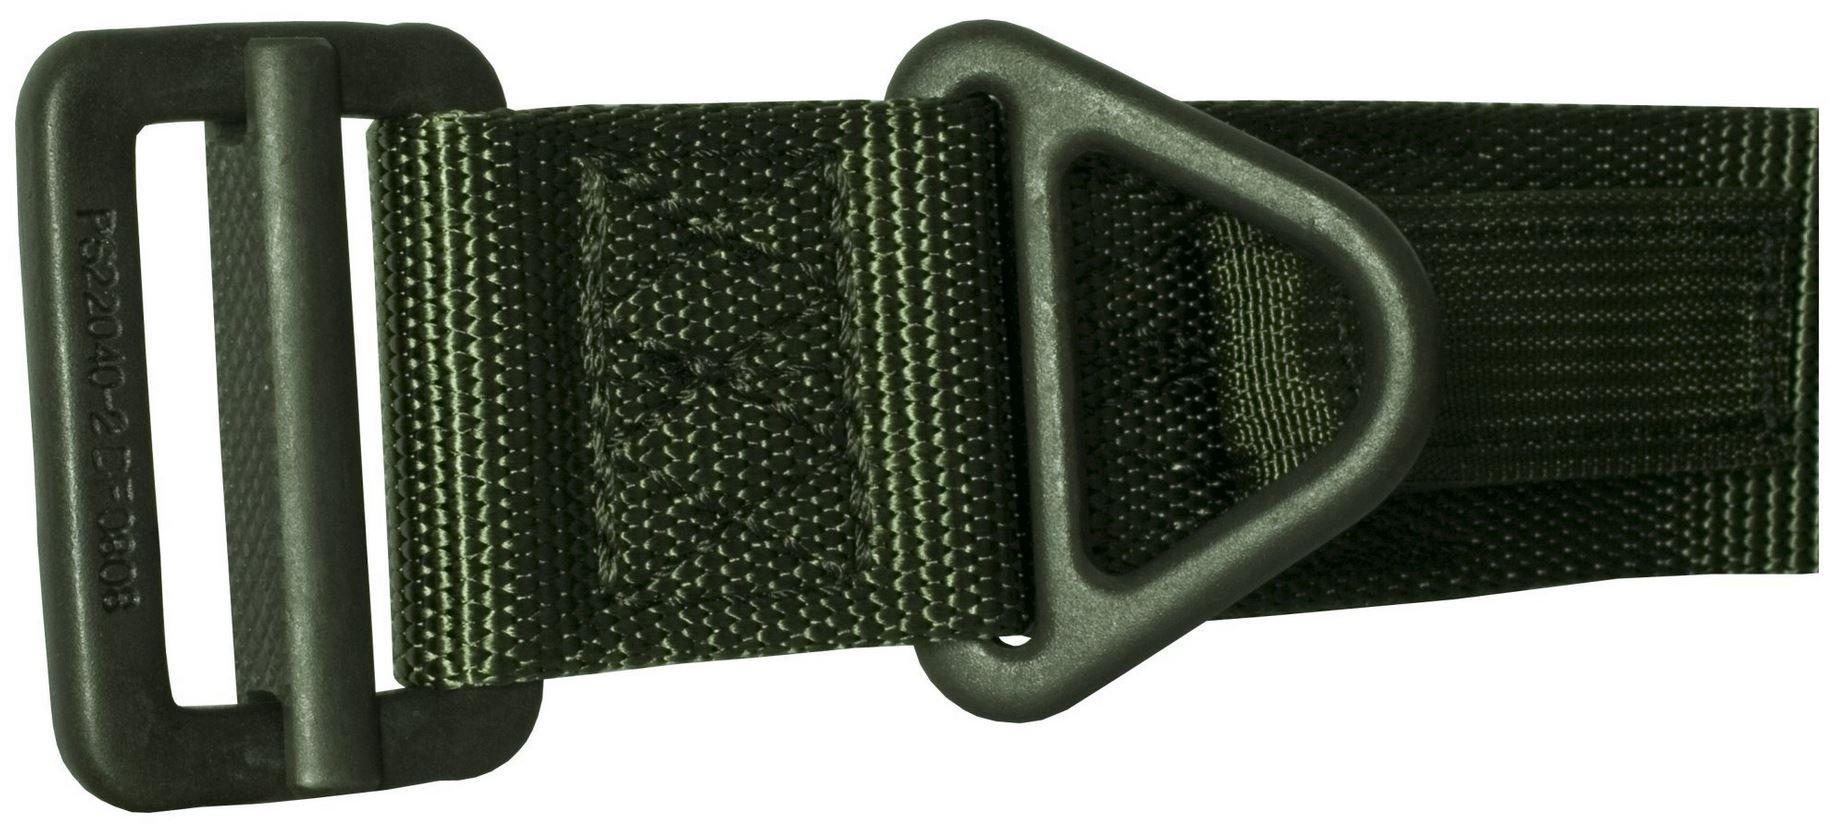 BLACKHAWK! CQB/Rigger's Belt - Olive Drab, Small by BLACKHAWK!